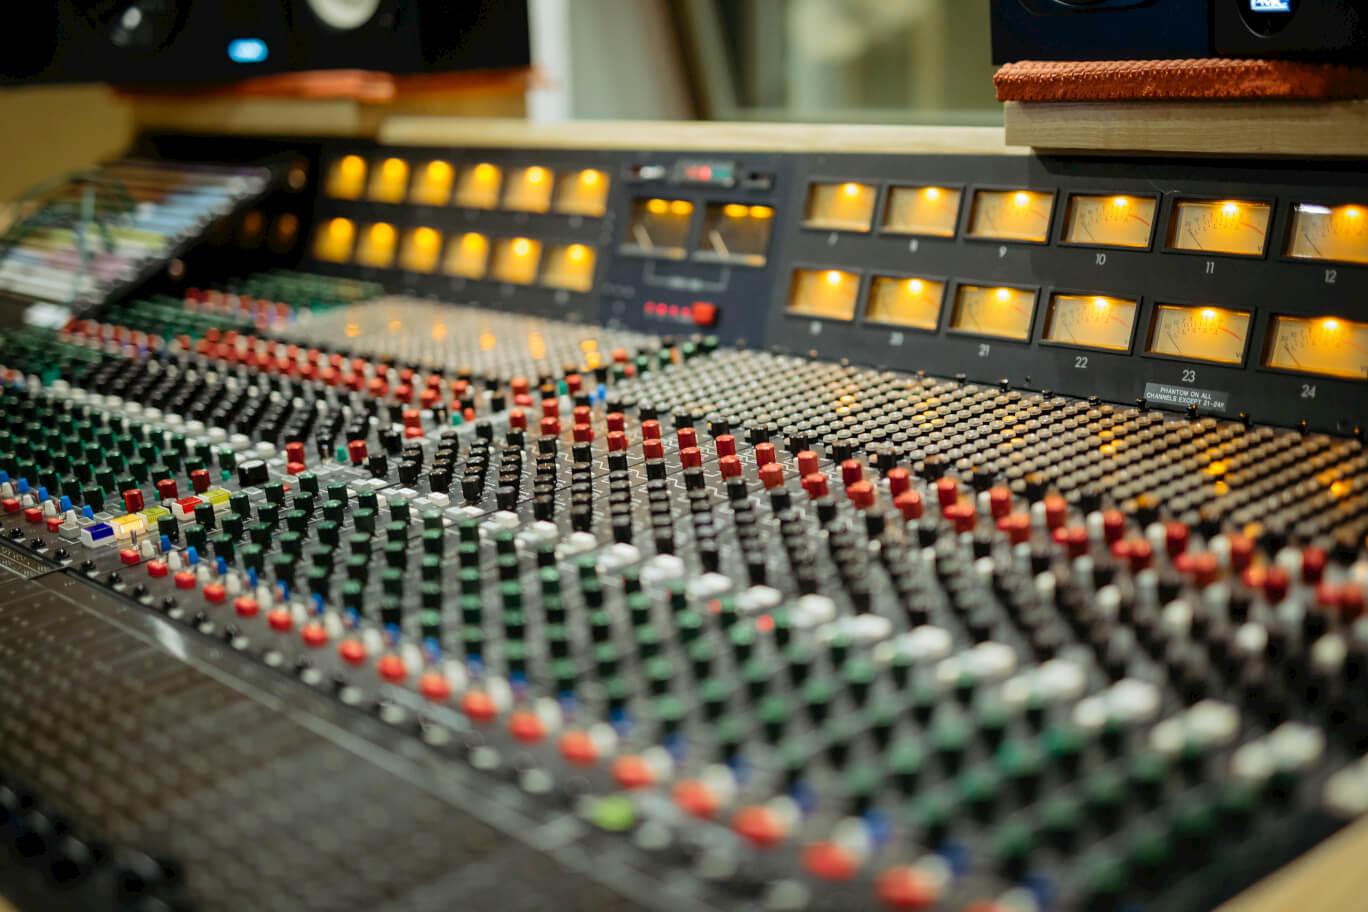 close-up-trident-80db-mixing-desk-evolution-studios-oxford-recording.jpg